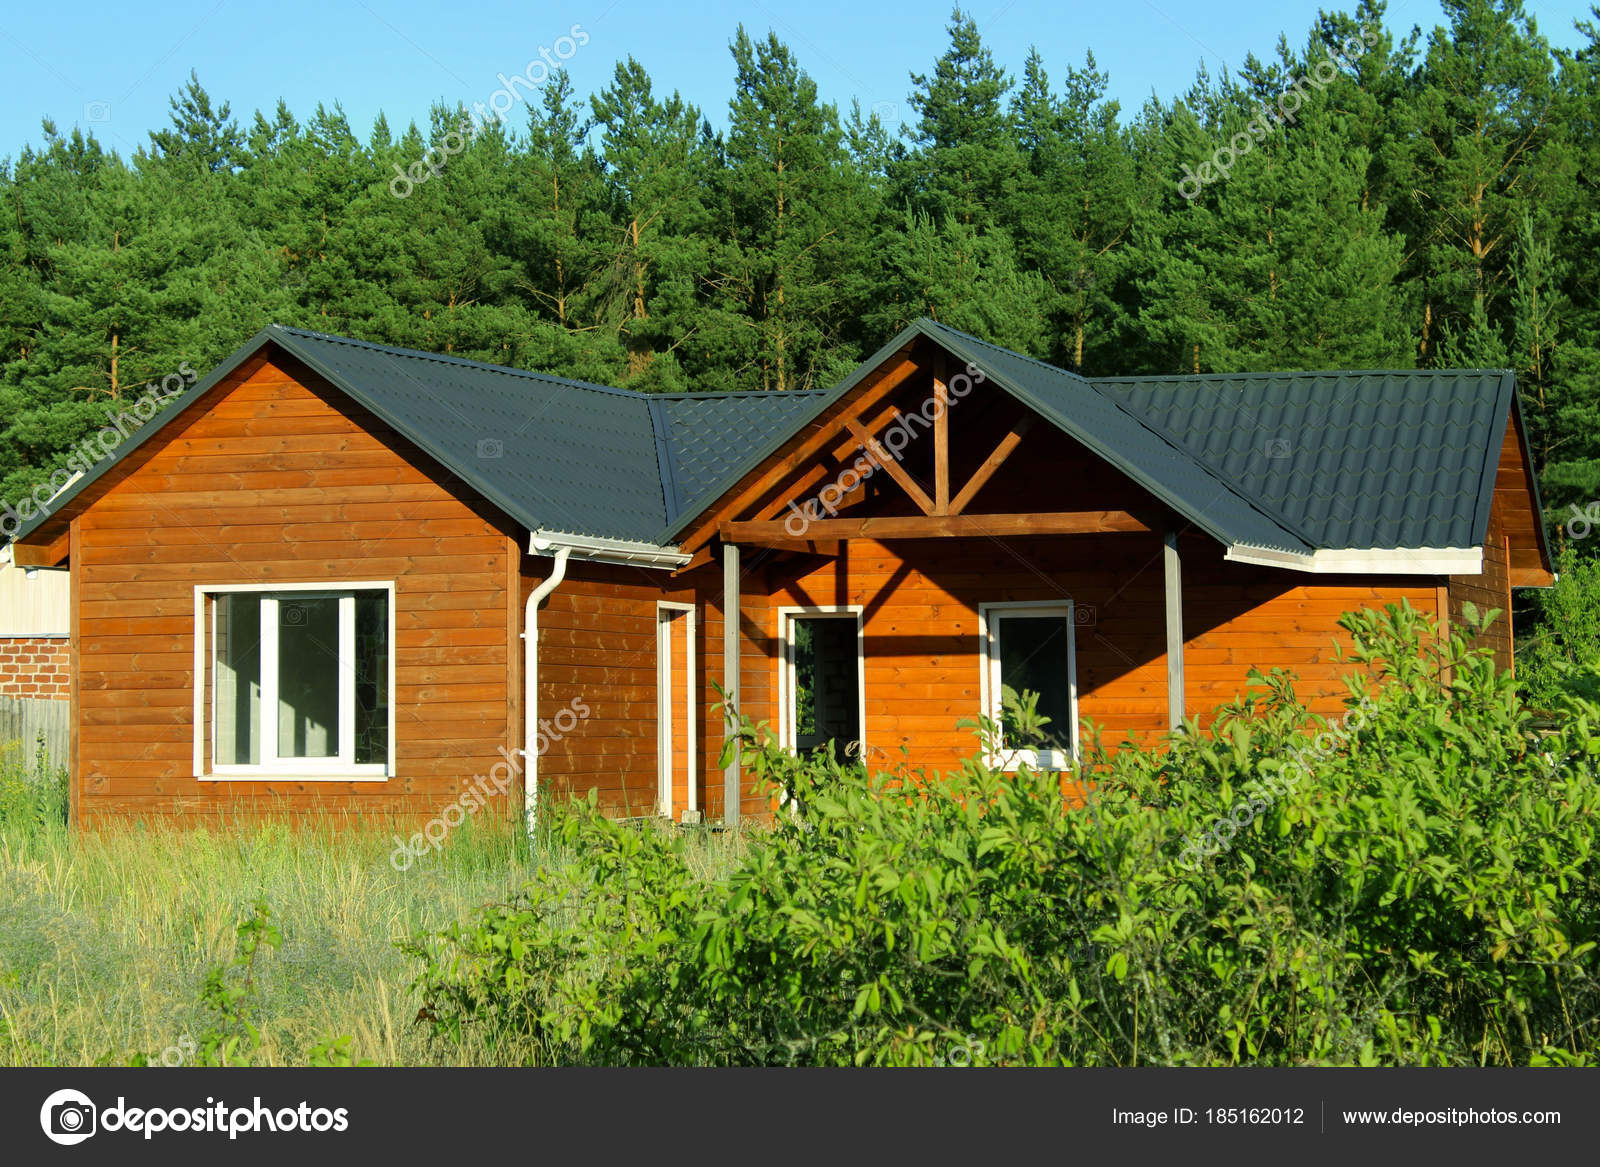 Holzhaus Landschaft Okologische Kleines Holzhaus Holzhaus